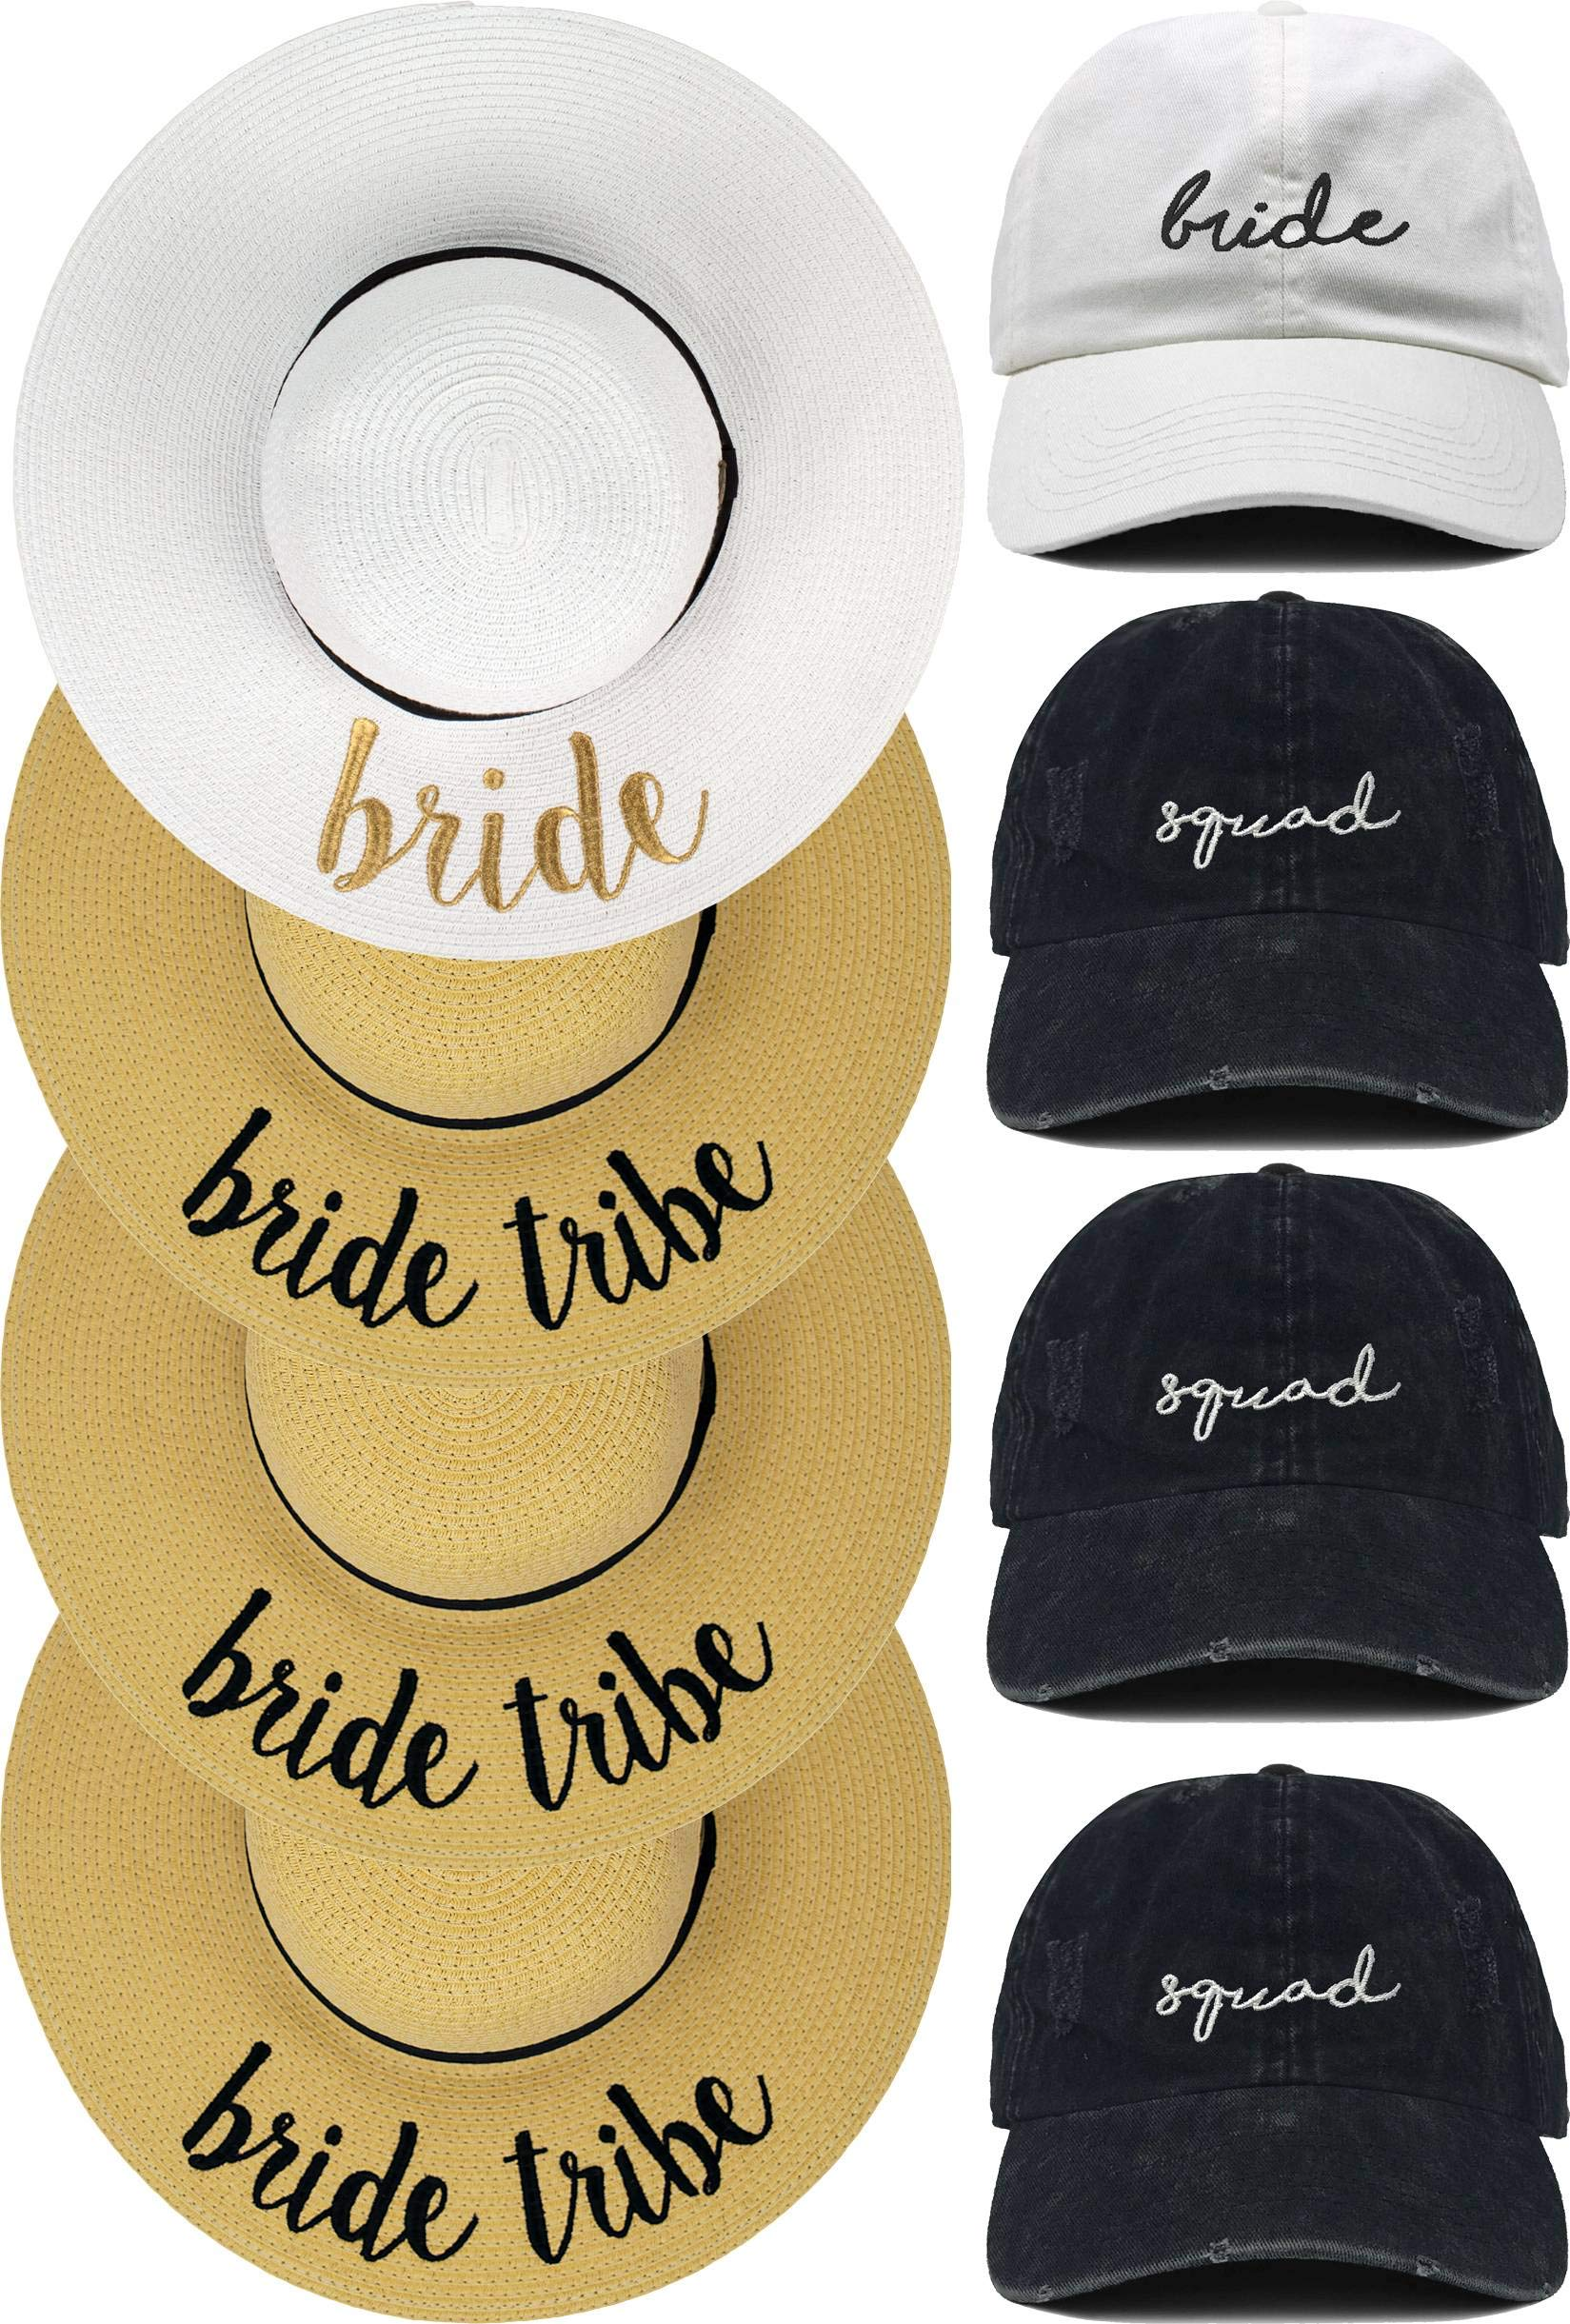 H-1714-4-BWG.3S Sun Hat/Dad Hat Bridal Bundle: 1 Bride, 3 Squad